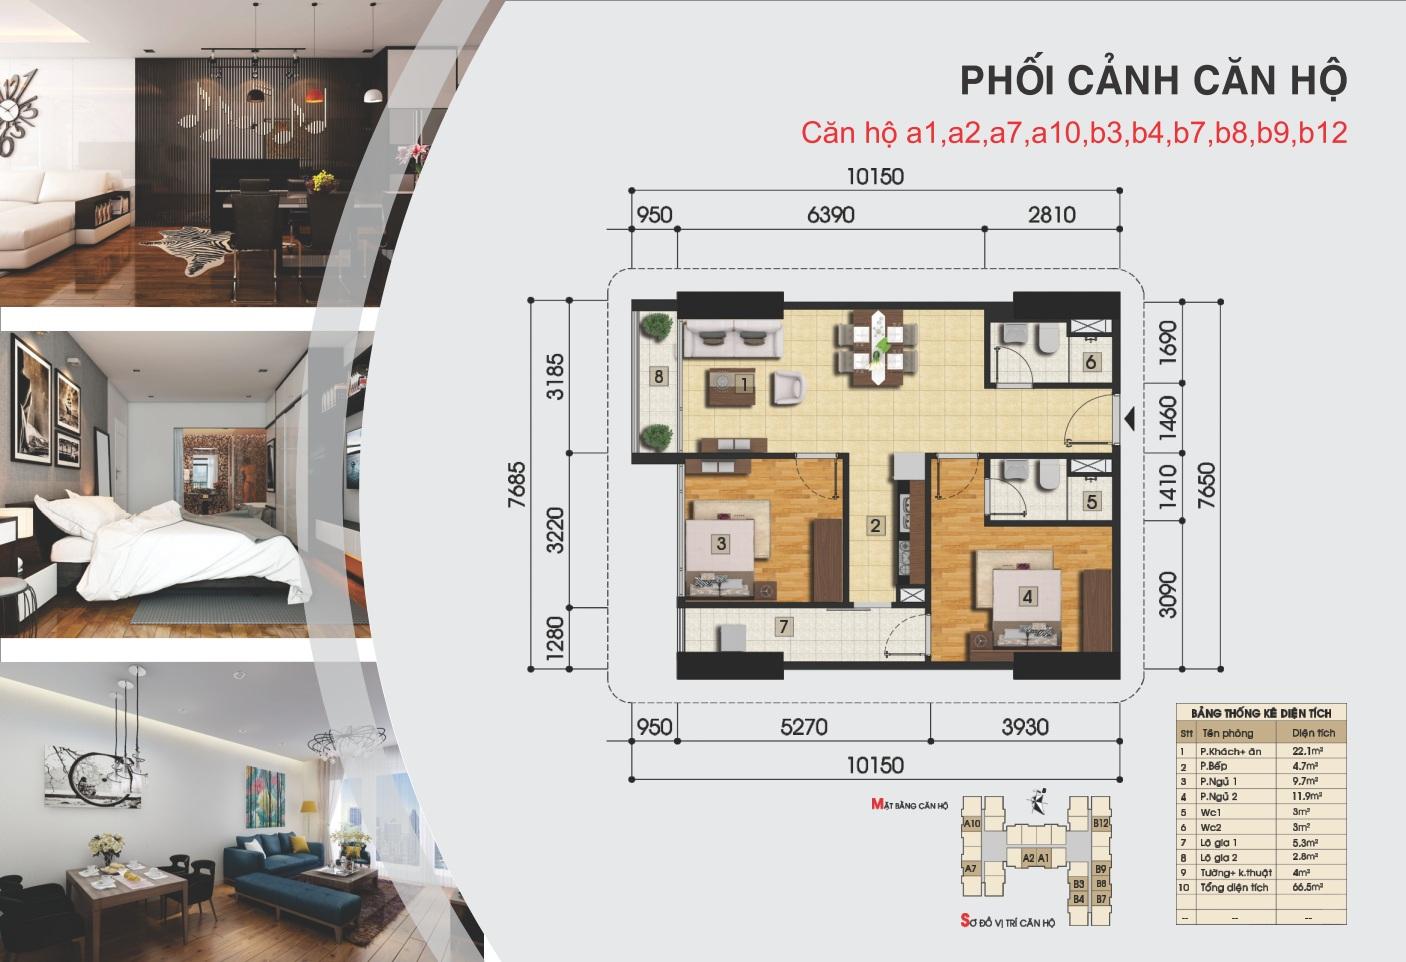 Thiết kế căn hộ a1, a2, a7, a10, b3-b12 - Gemek Tower II